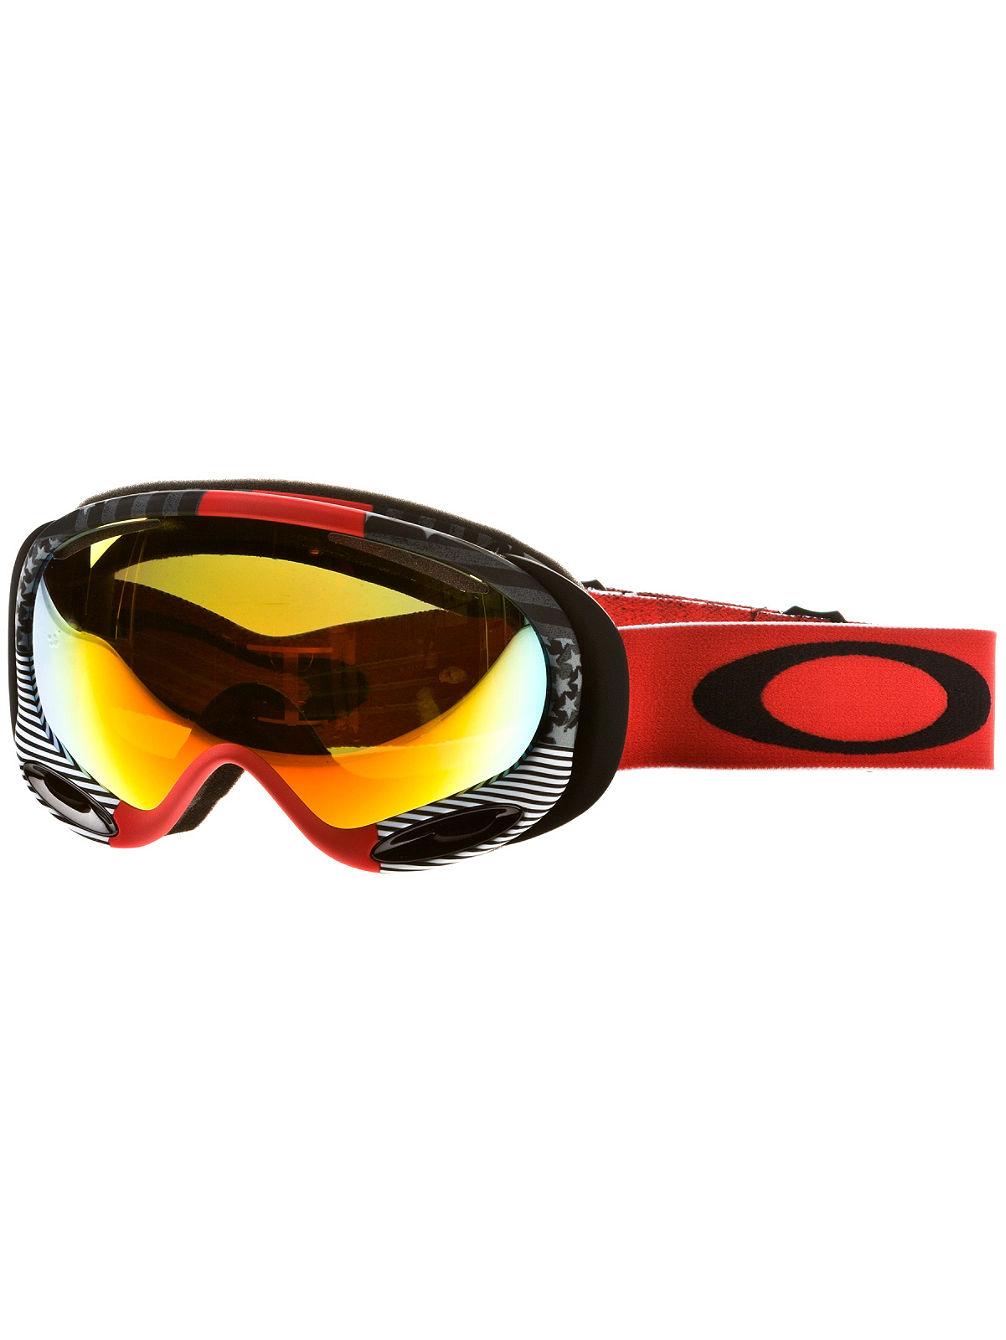 be52c16769 Oakley A Frame Shaun White Goggles